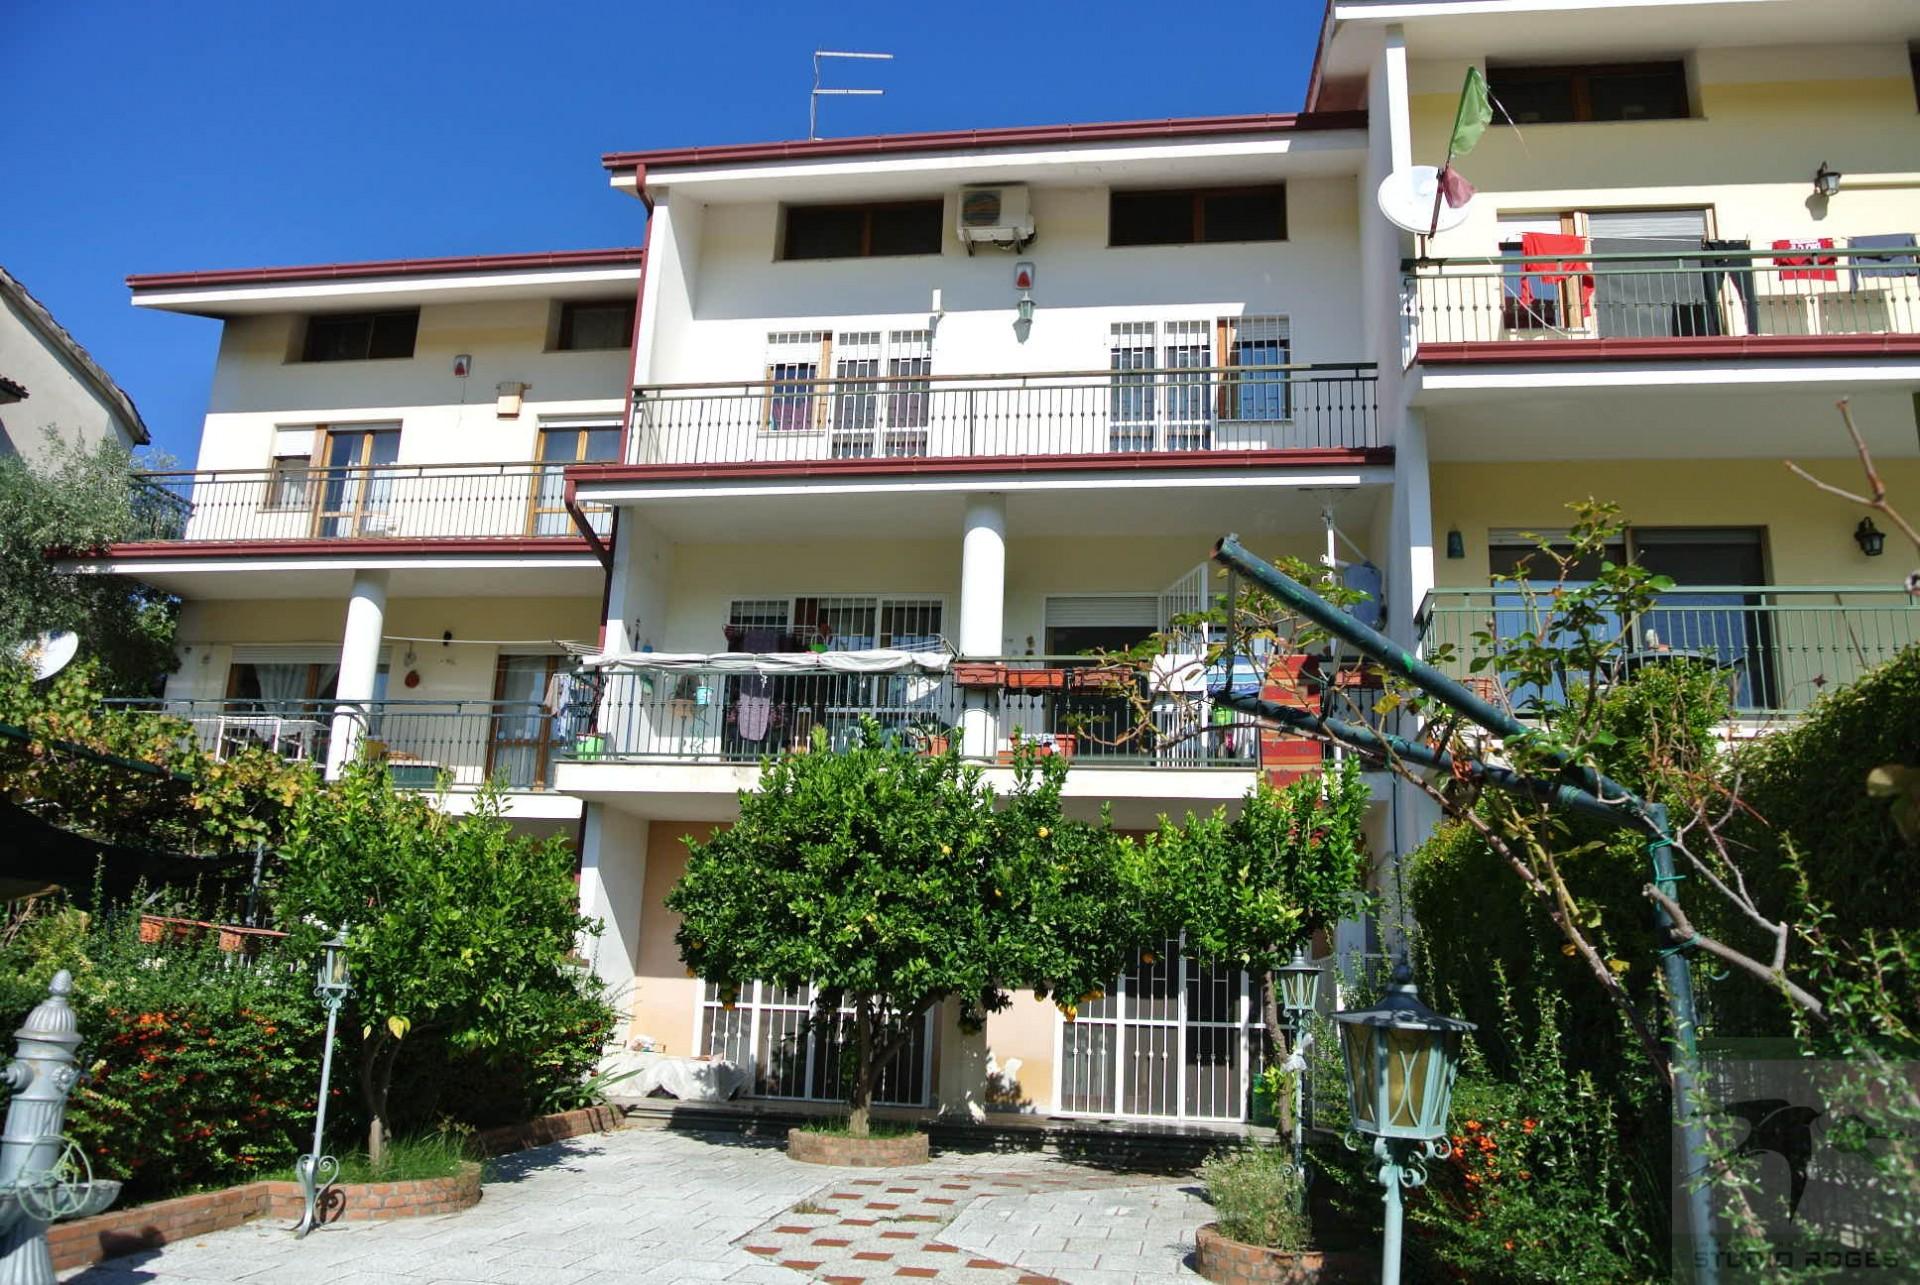 Villa in Vendita 300,00 mq - N. camere: 5 - - Mendicino - C.da Rosario (CS)